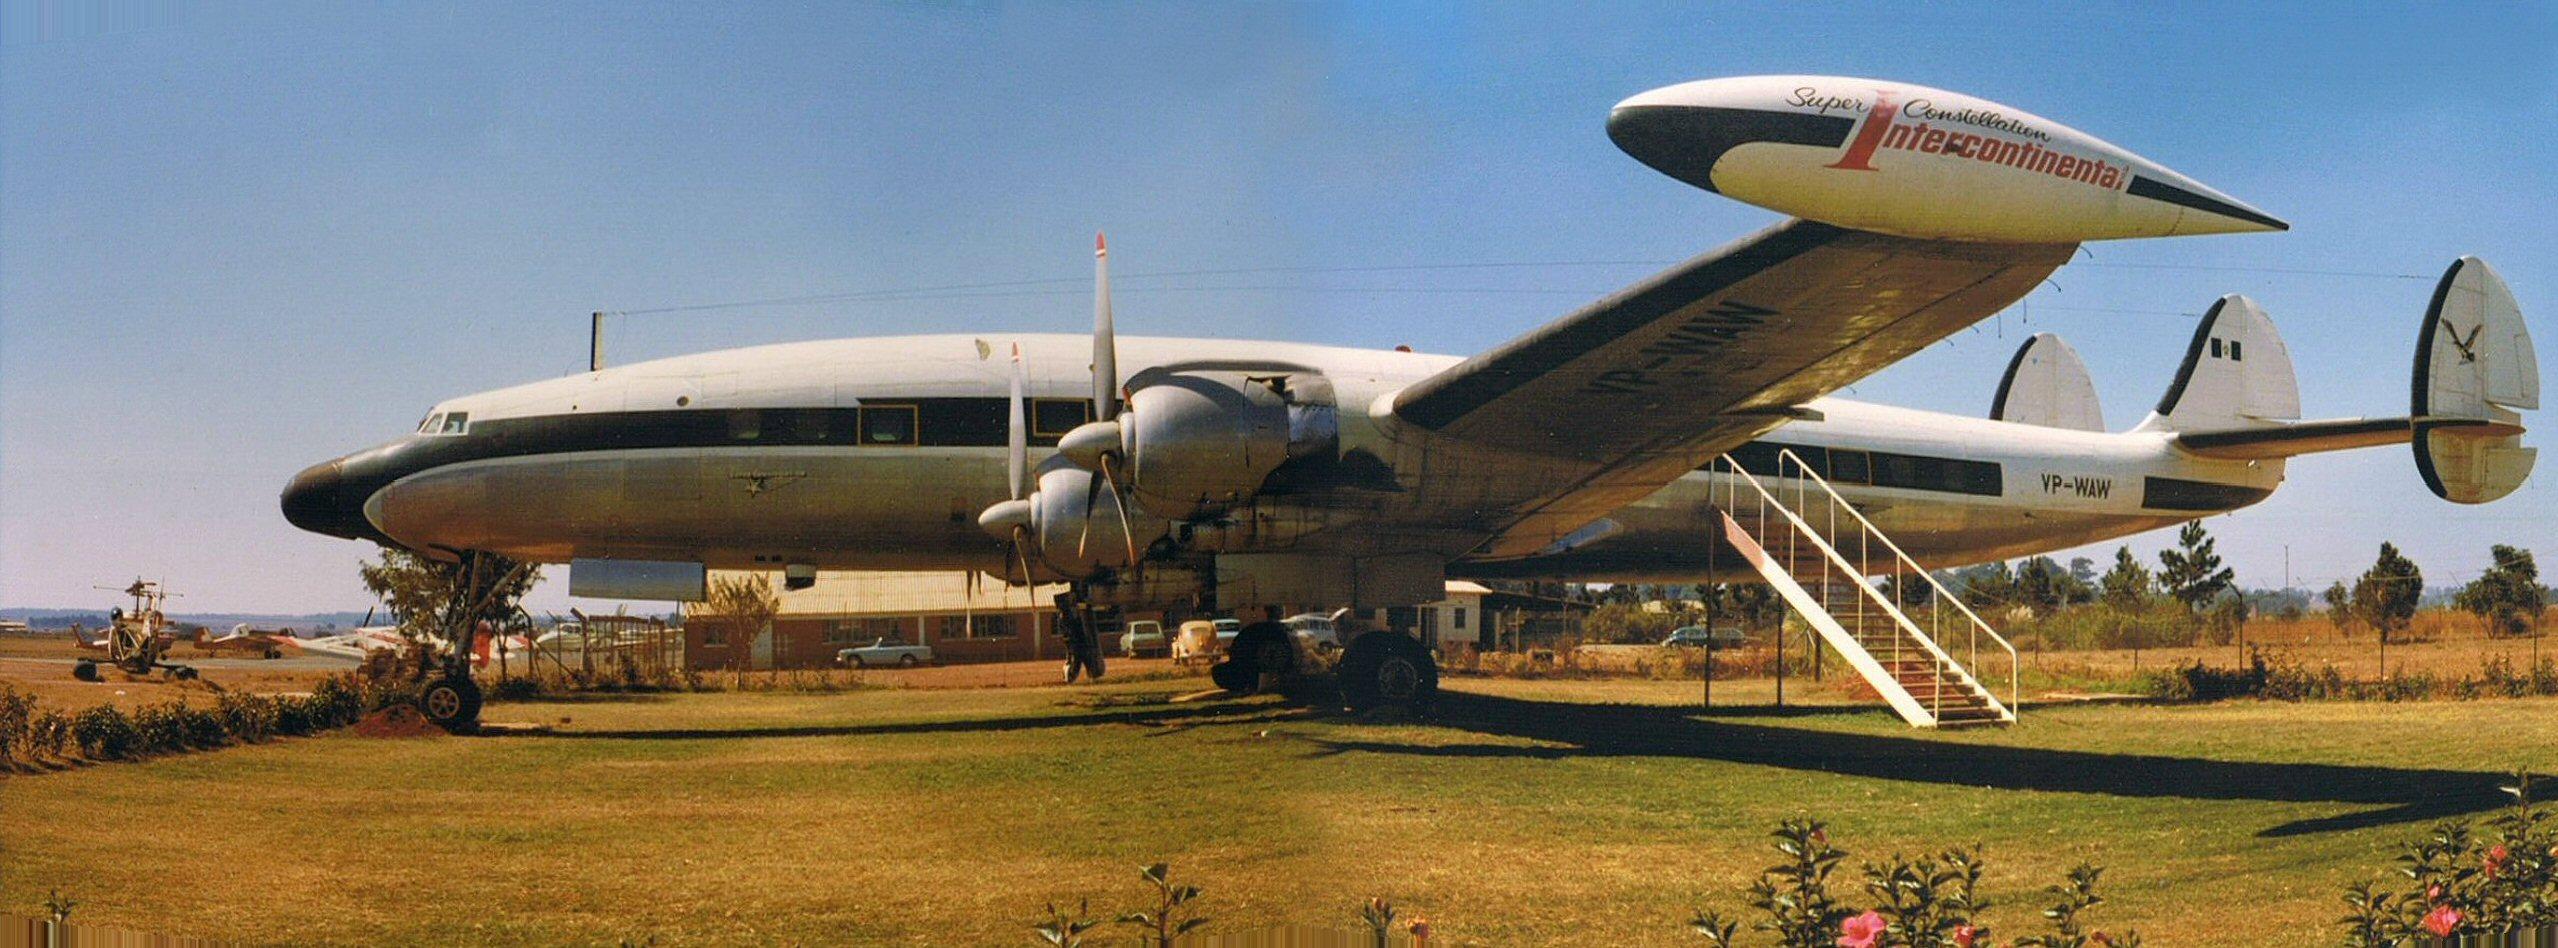 Old Time Car Wallpaper File Super Constellation At Salisbury Airport Rhodesia Jpg